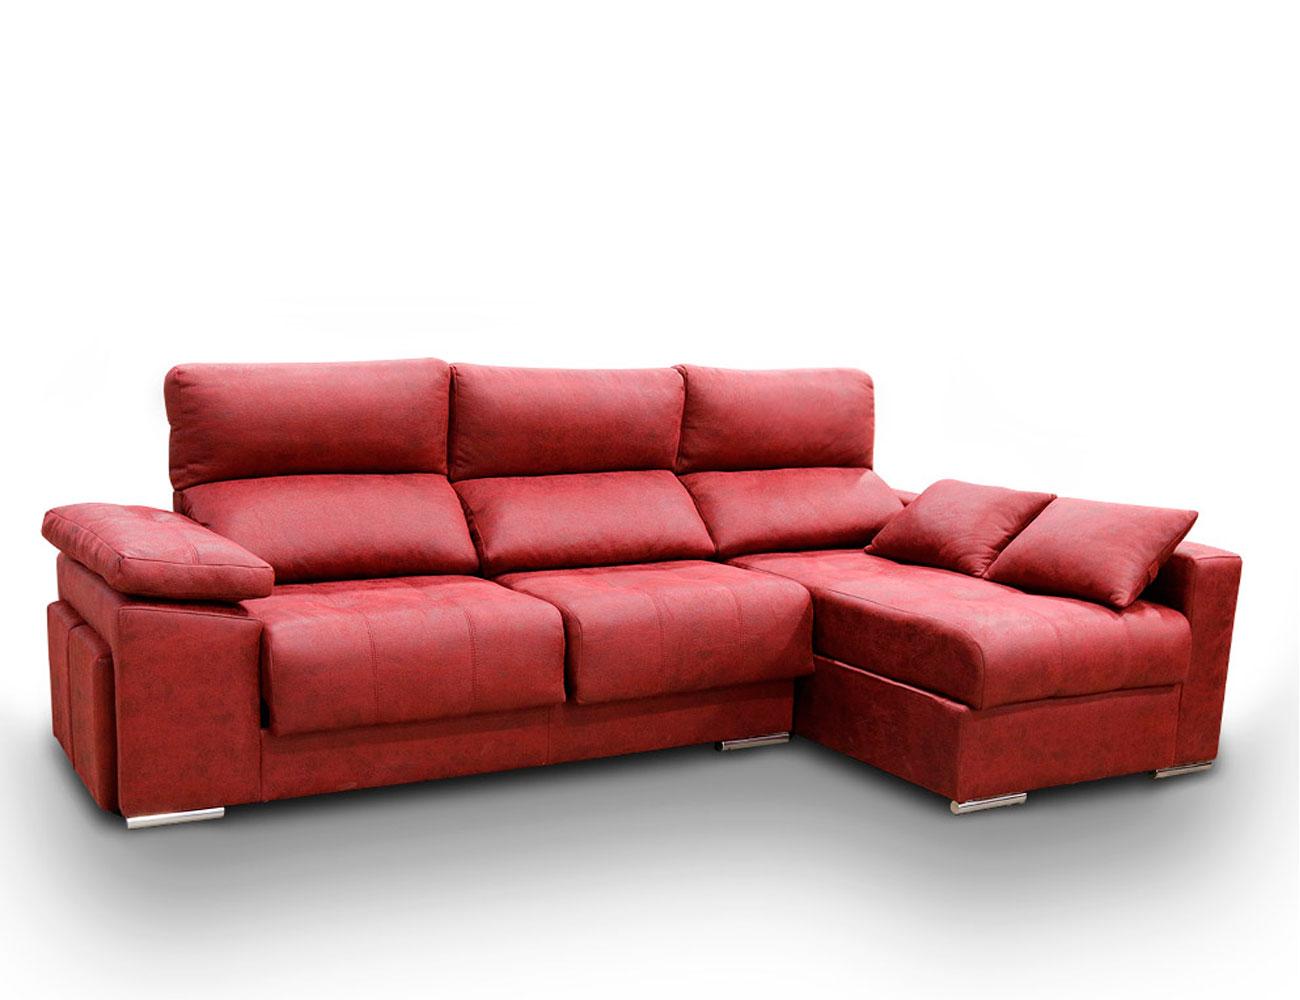 Sofa chaiselongue anti manchas rojo granate7